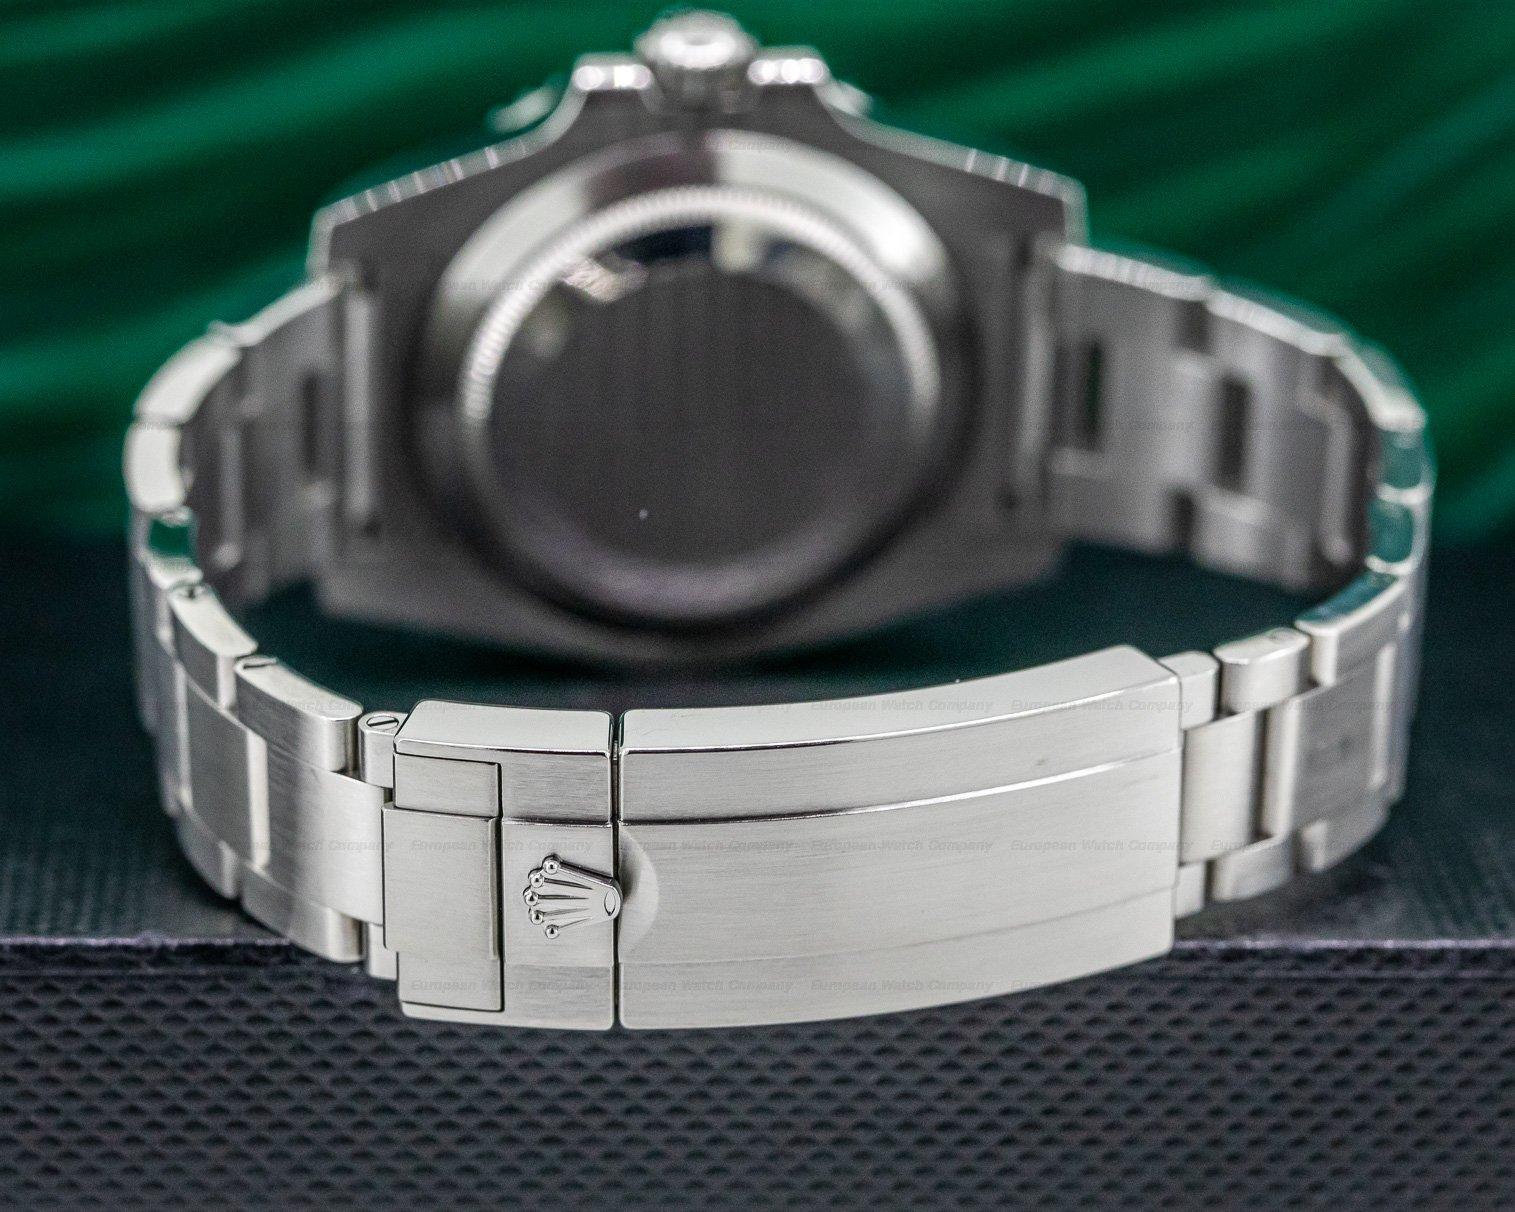 Rolex 114060 Submariner No Date Ceramic Bezel SS